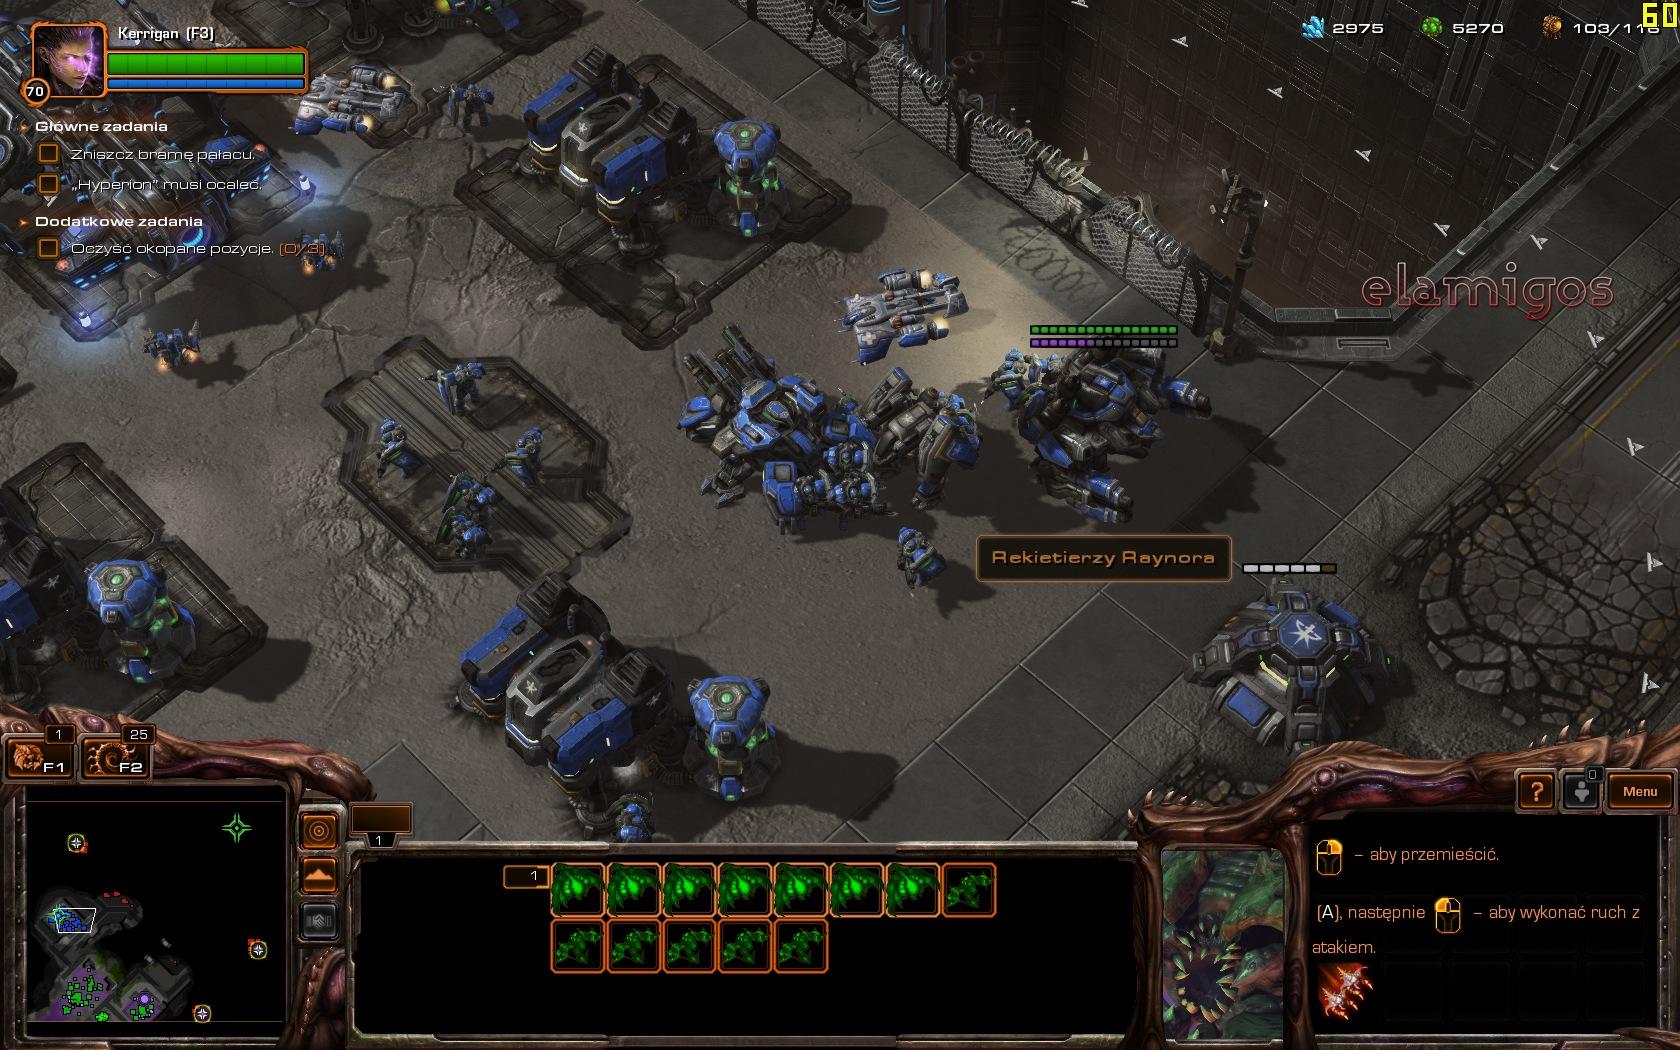 Download Warcraft II: Tides of Darkness - My Abandonware